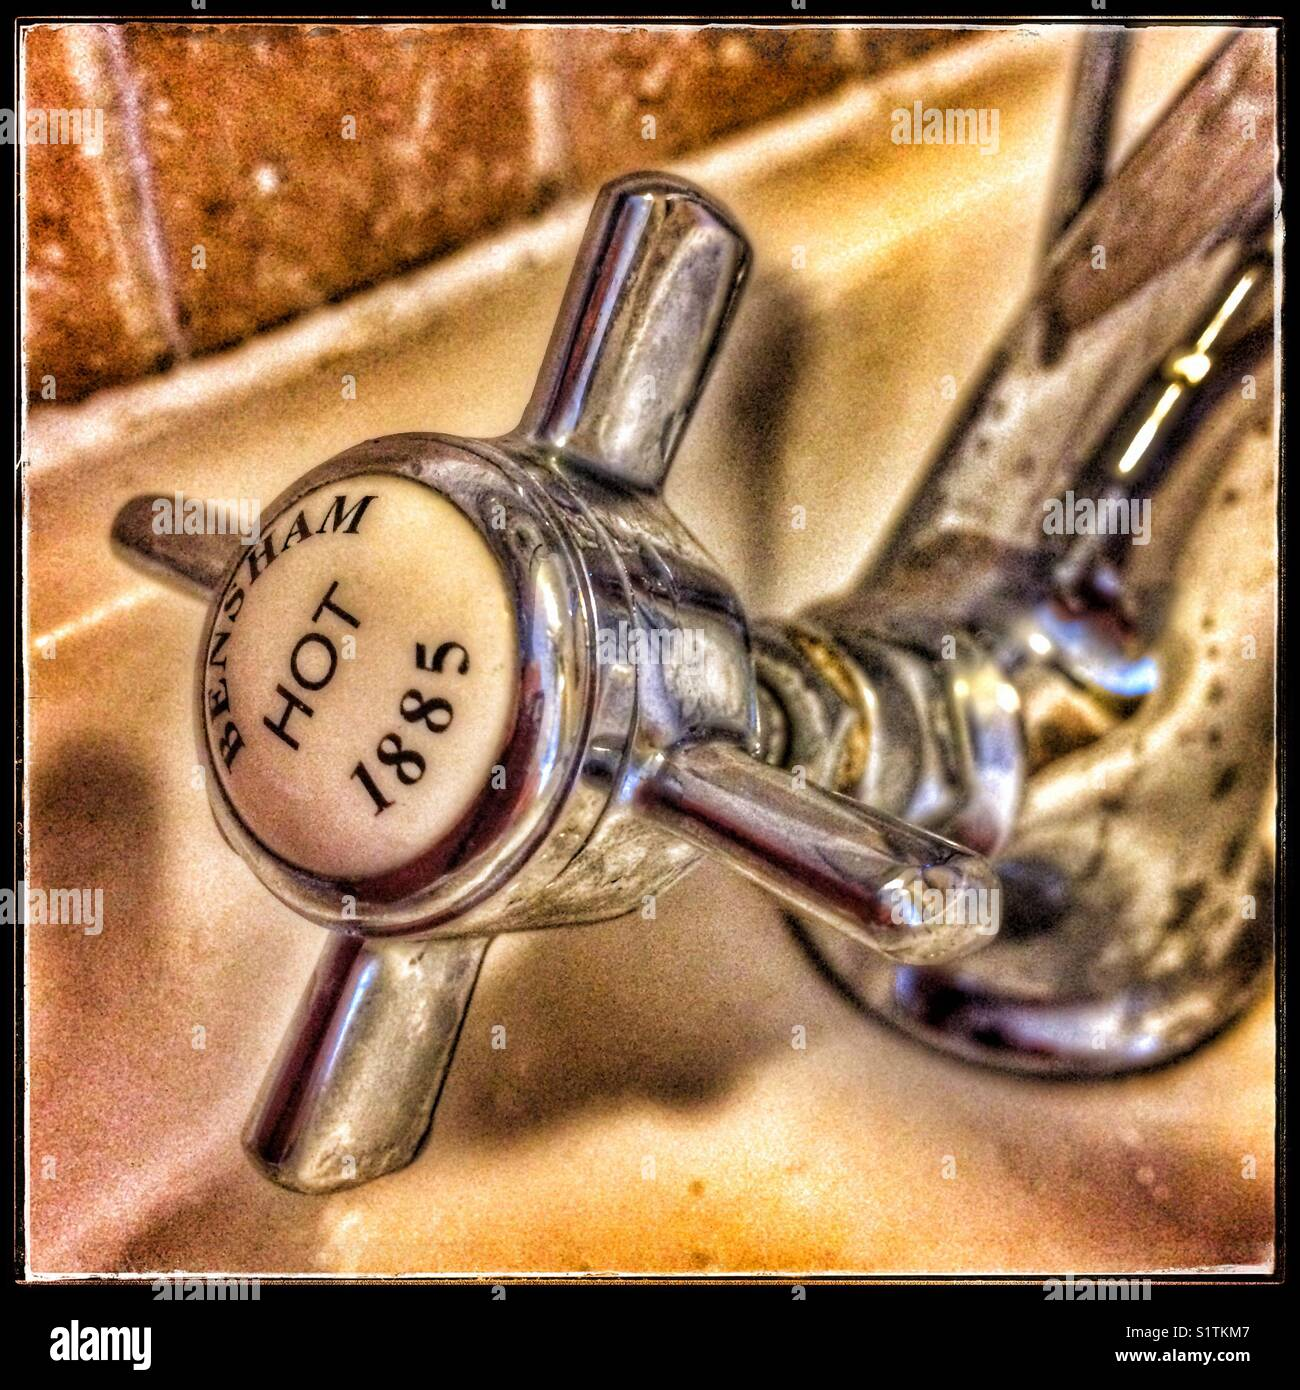 Hot water tap - Stock Image